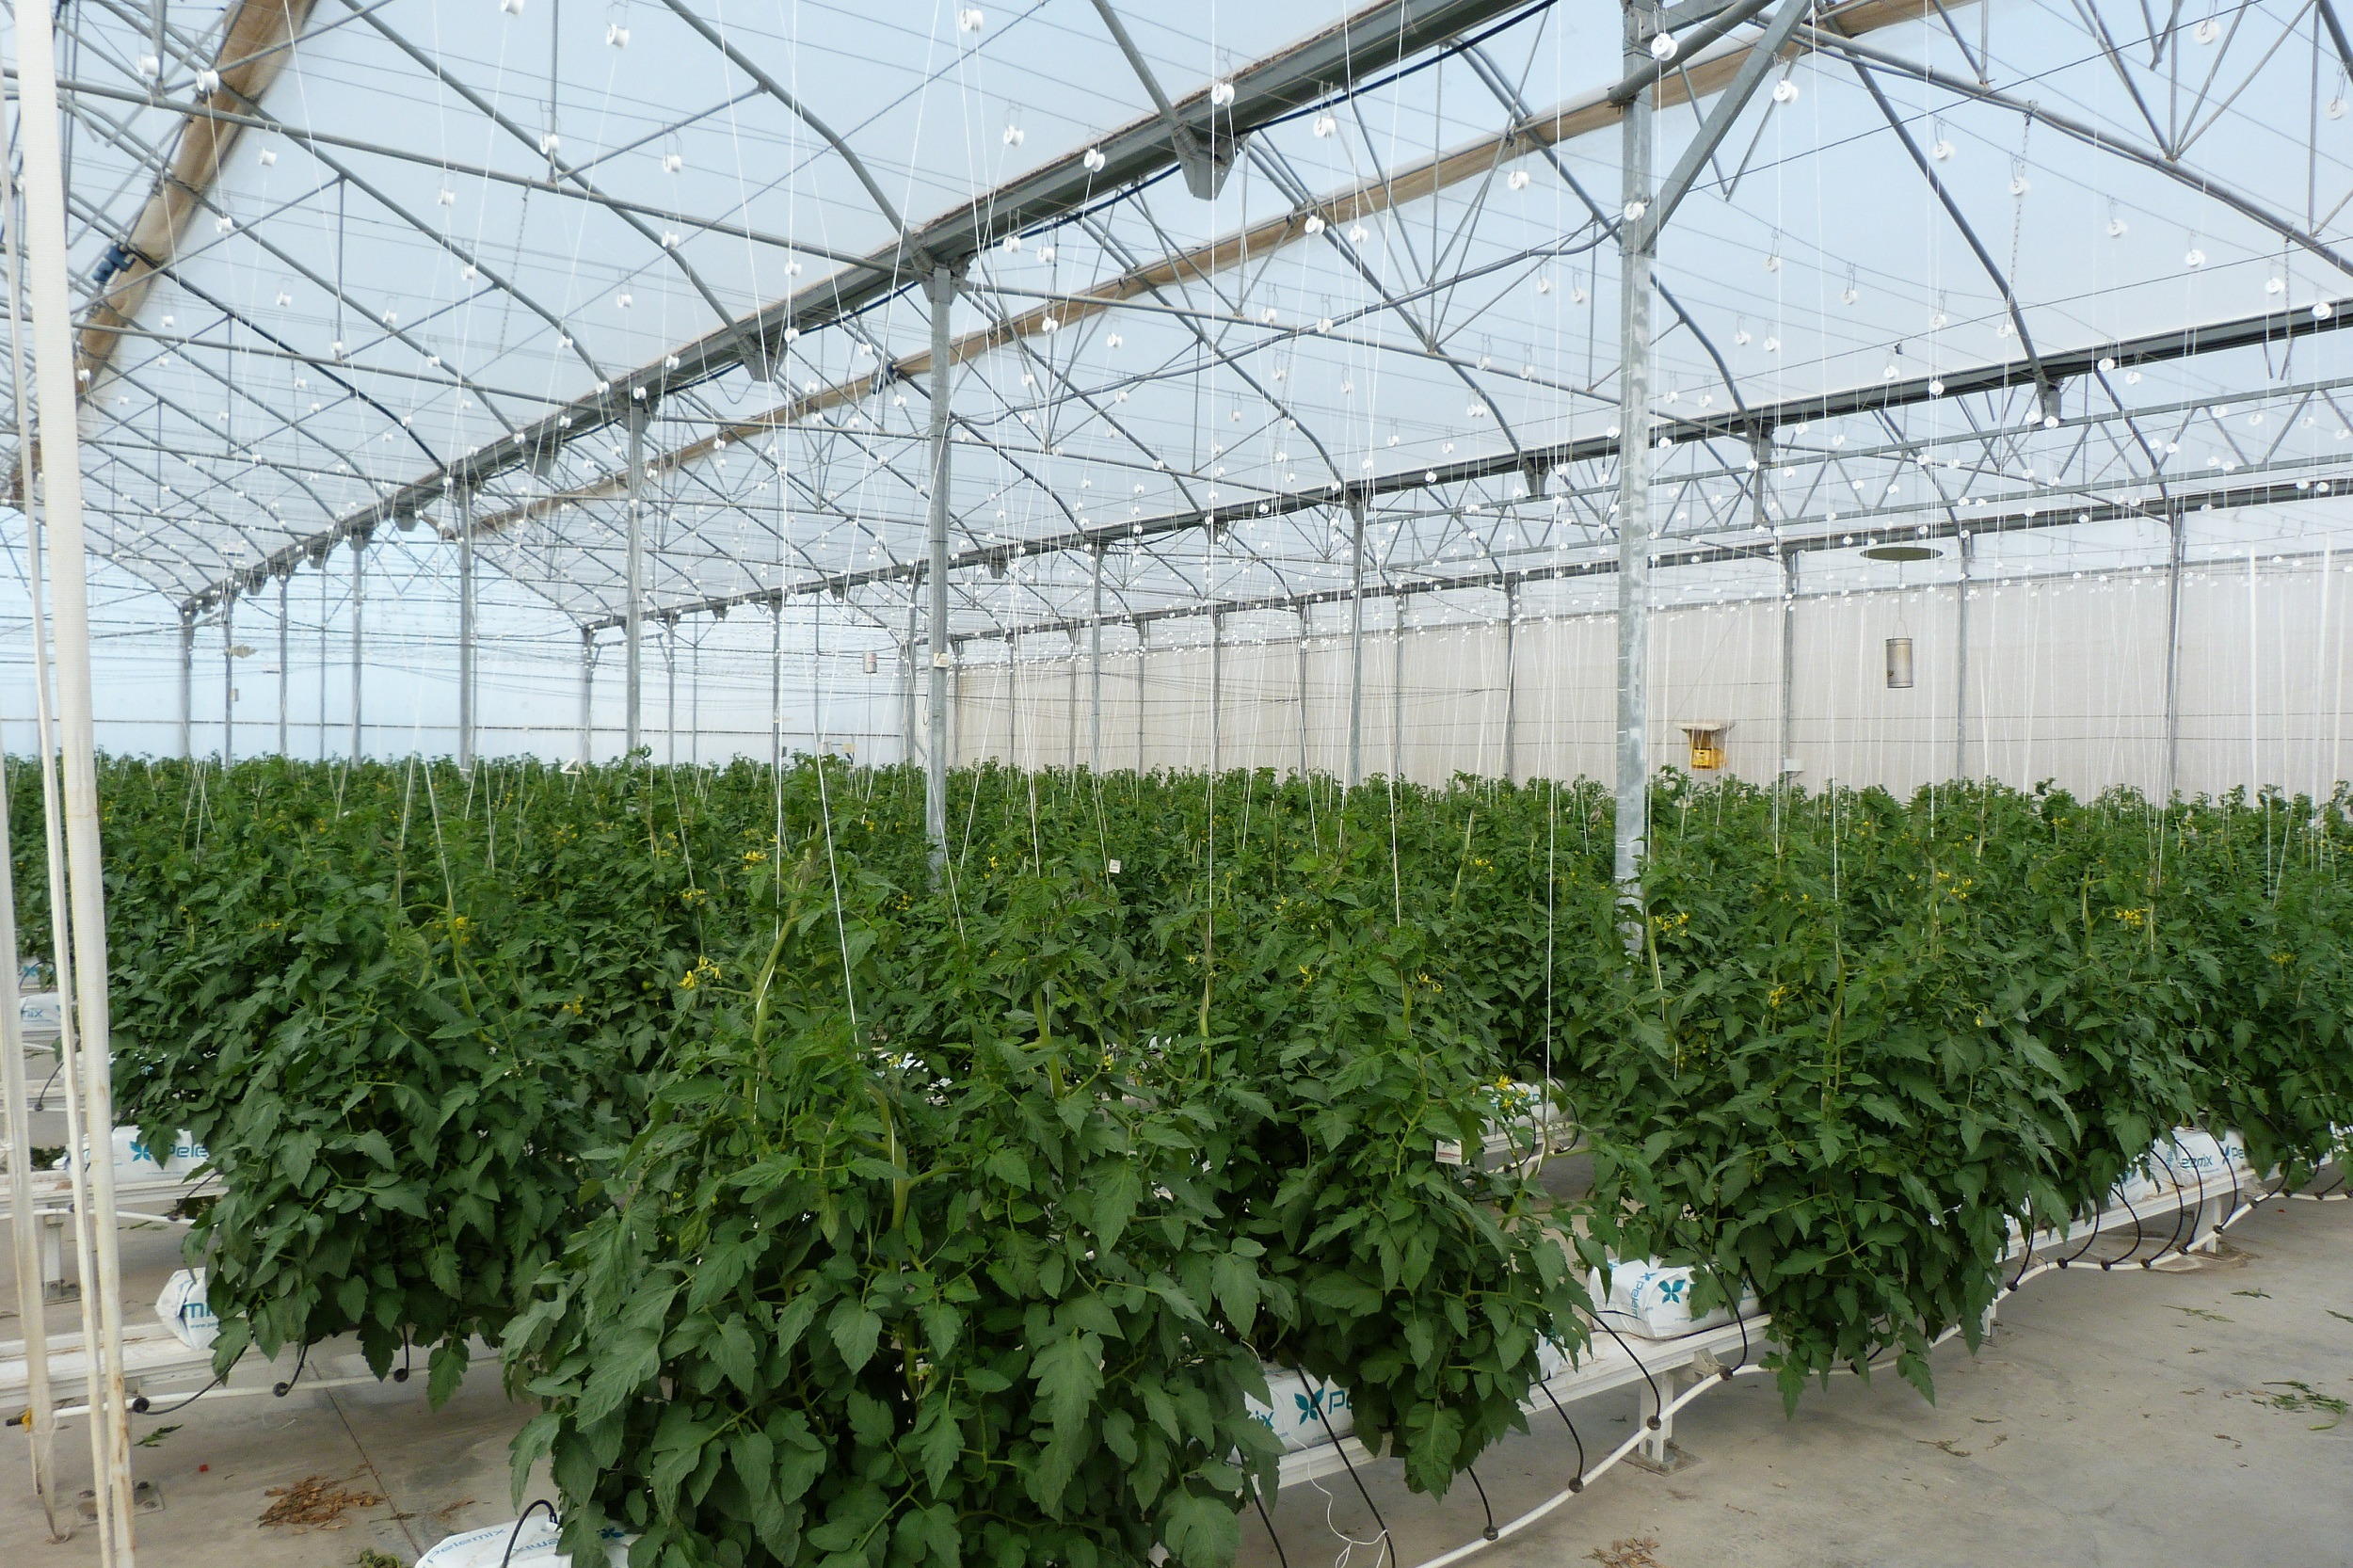 Extenda apuesta por Kazajistán y Uzbekistán como mercados estratégicos para el sector de los fertilizantes agrícolas de Andalucía